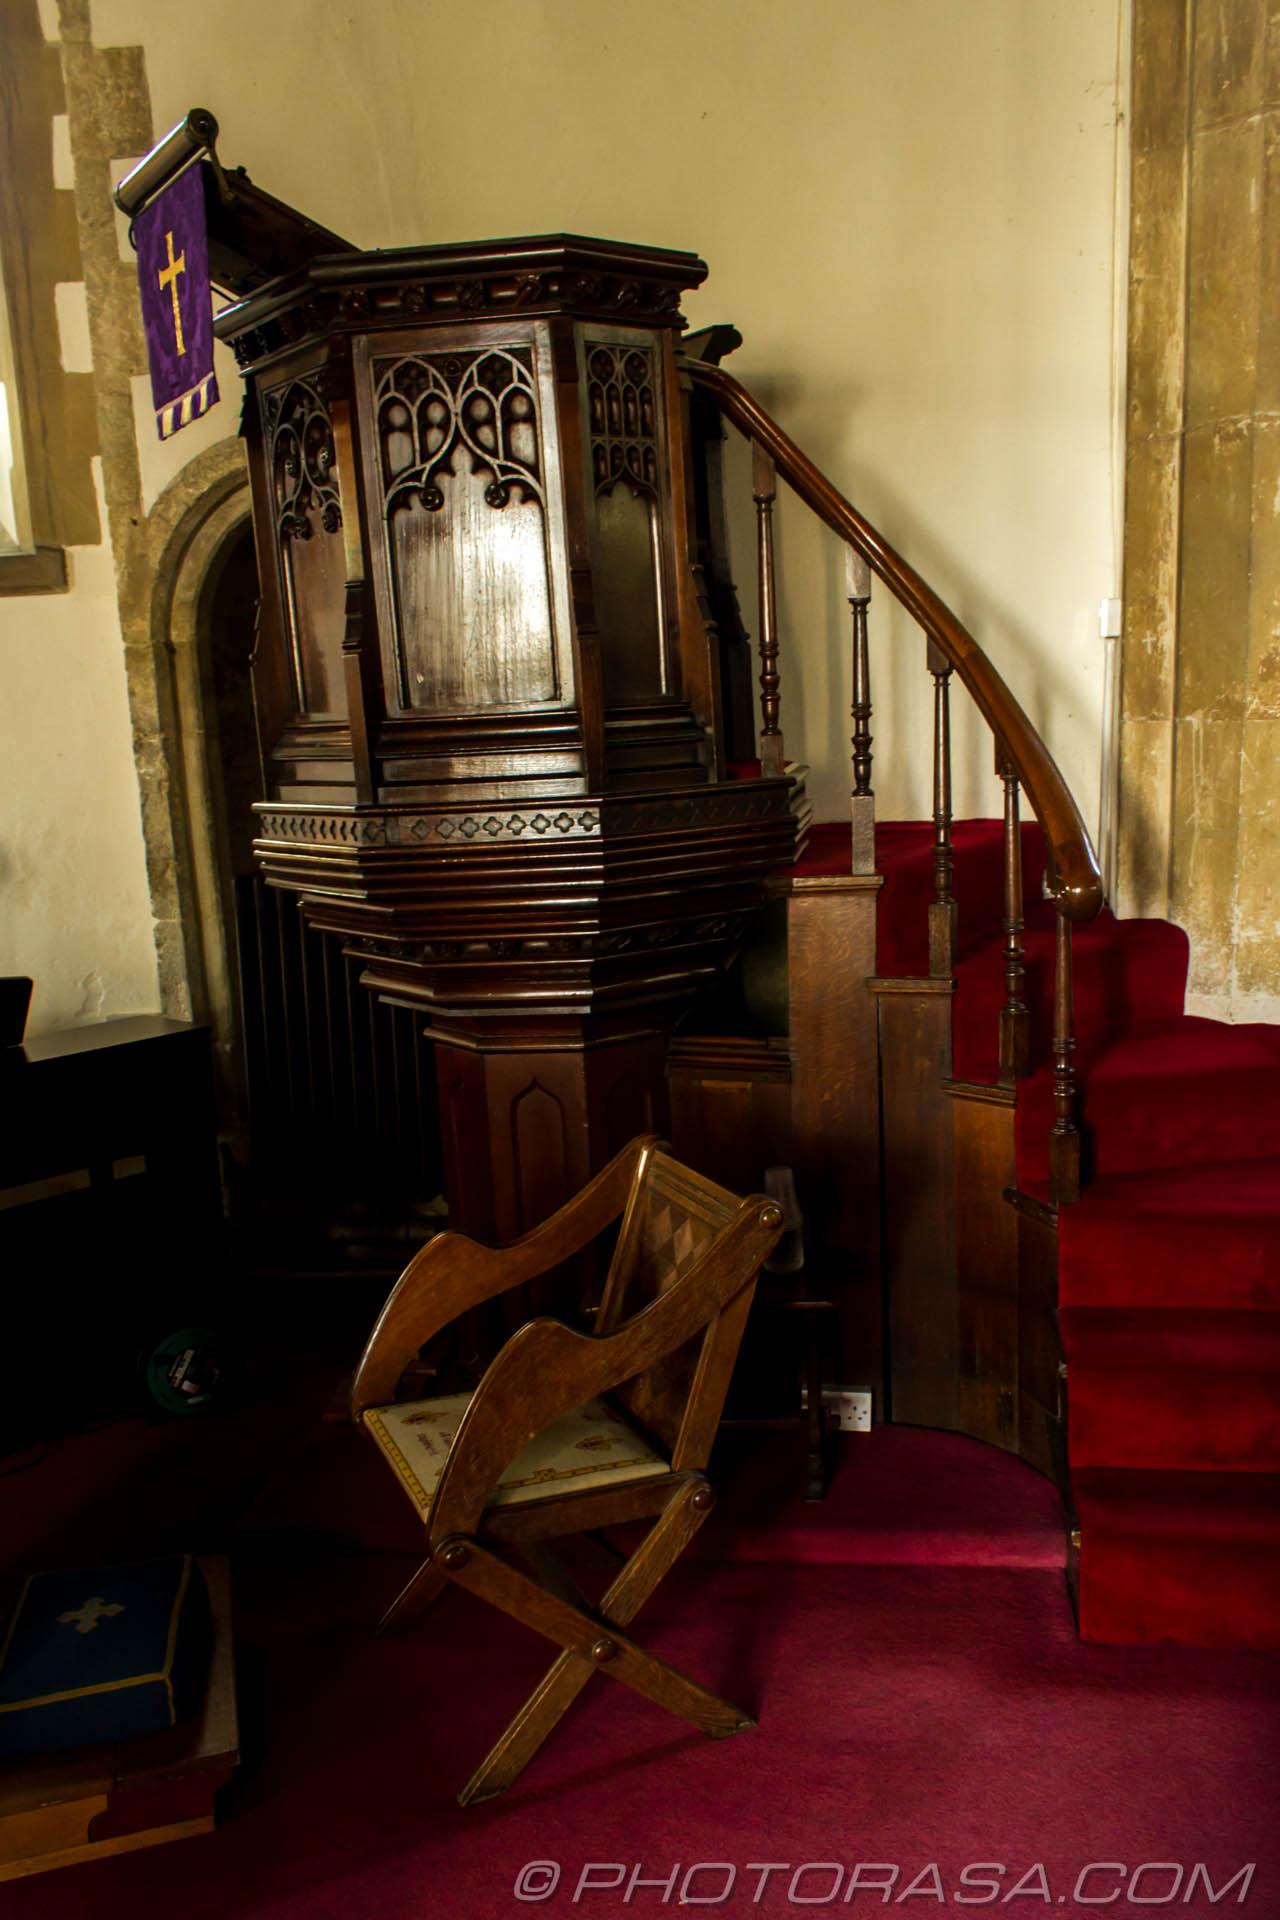 https://photorasa.com/saints-church-staplehurst-kent/chair-and-pulpit/